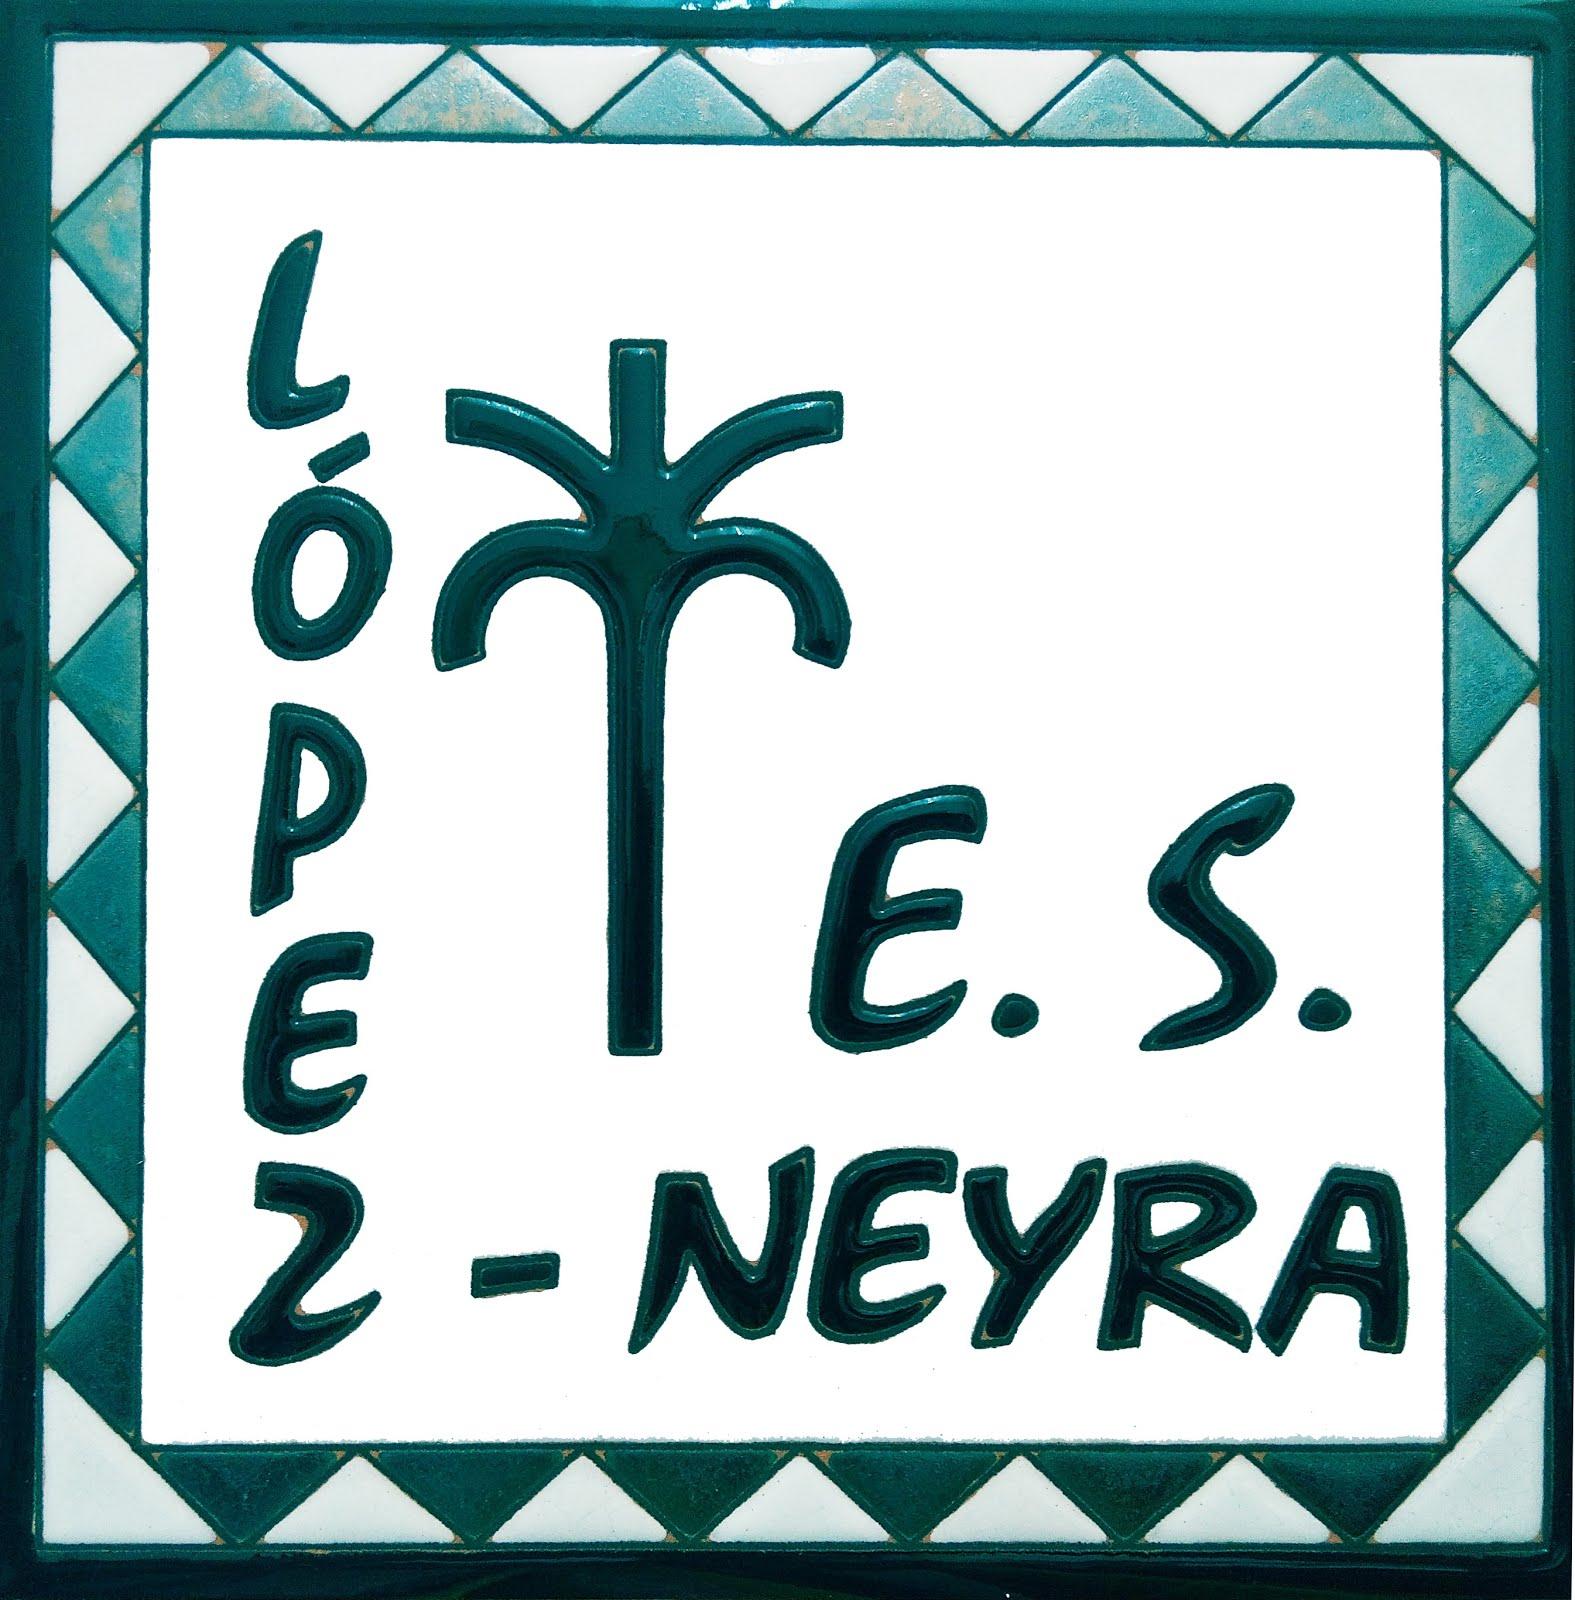 IES LÓPEZ-NEYRA